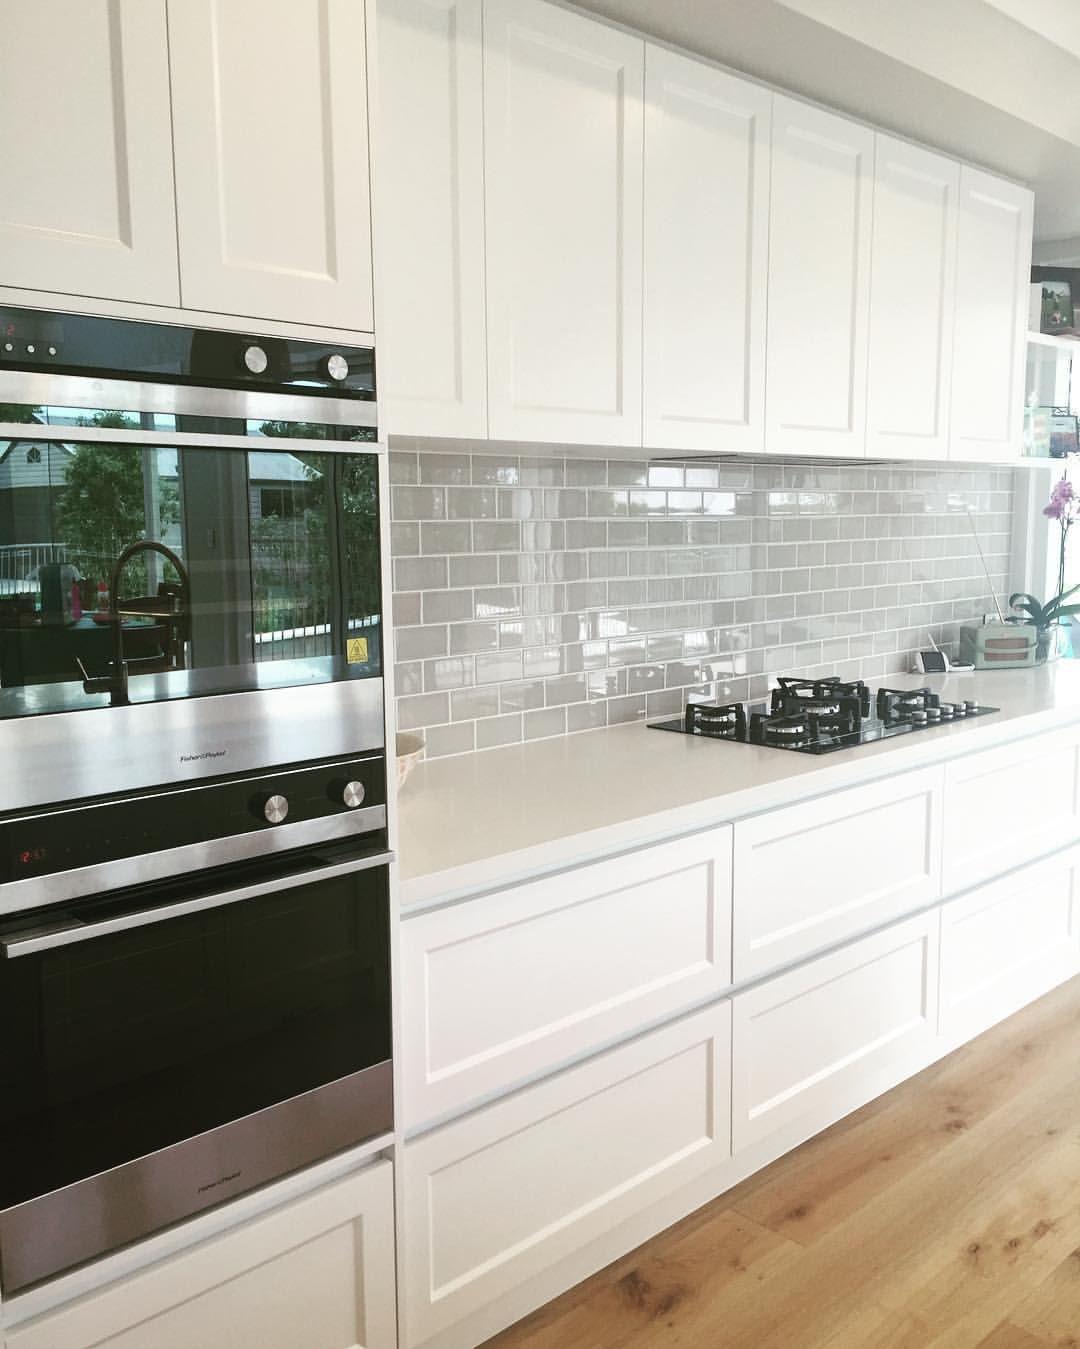 Handleless Profile Kitchen Love The Streamline Look With No Handles Wk Quantumqu Kitchen Cabinets Without Handles Kitchen Without Handles Kitchen Design